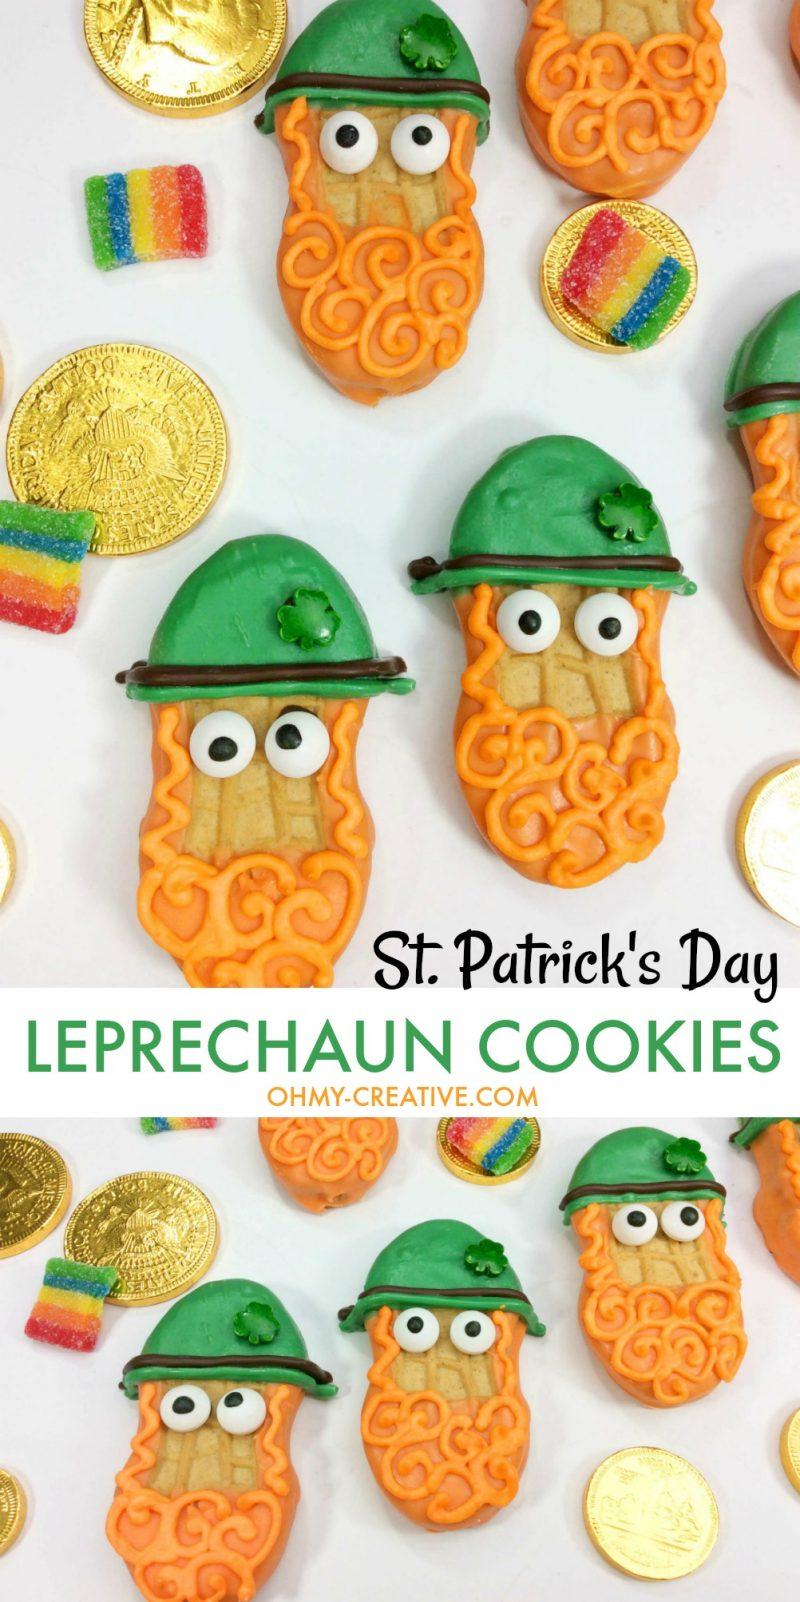 Leprechaun Treats | OHMY-CREATIVE.COM | Leprechaun Cookies | St. Patrick's Day Cookies | St. Patrick's Day Treats | Leprechaun Ideas | Leprechaun For Kids #leprechauncookies #stpatricksday #stpatricksdaydessert #stpatricksdaycookies